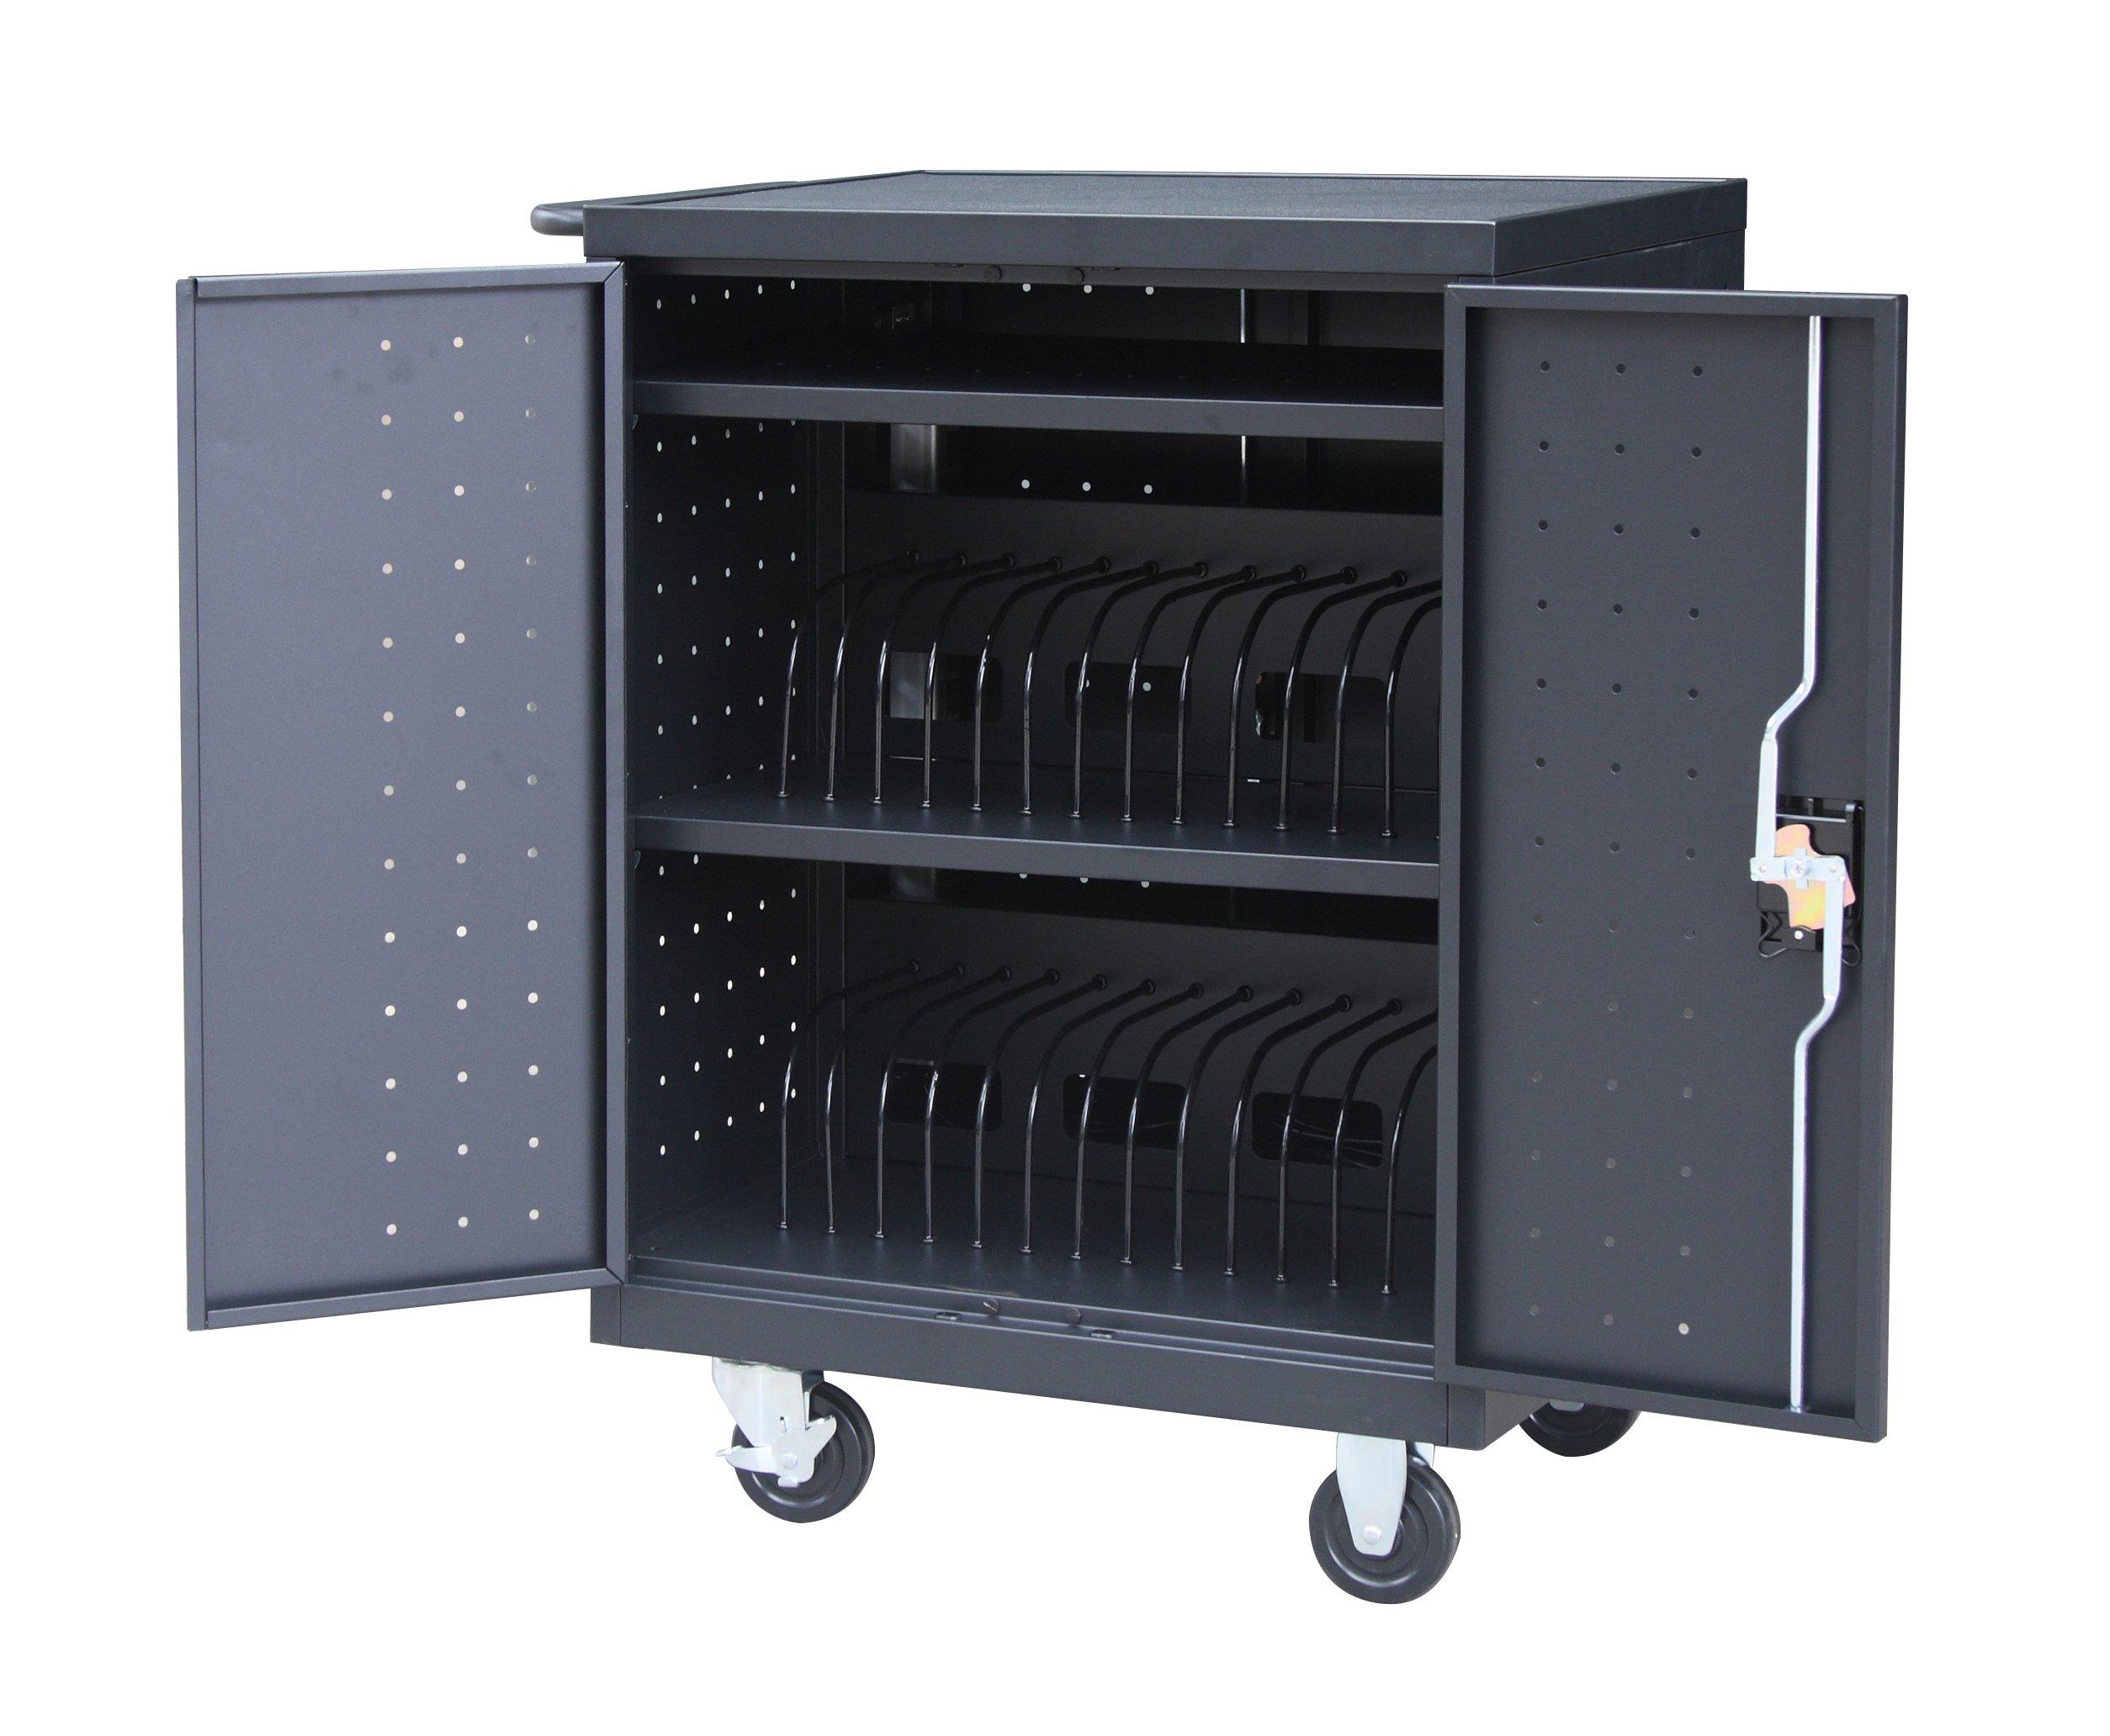 Pearington 30 Bay Tablet/Laptop Charging Cart, Black